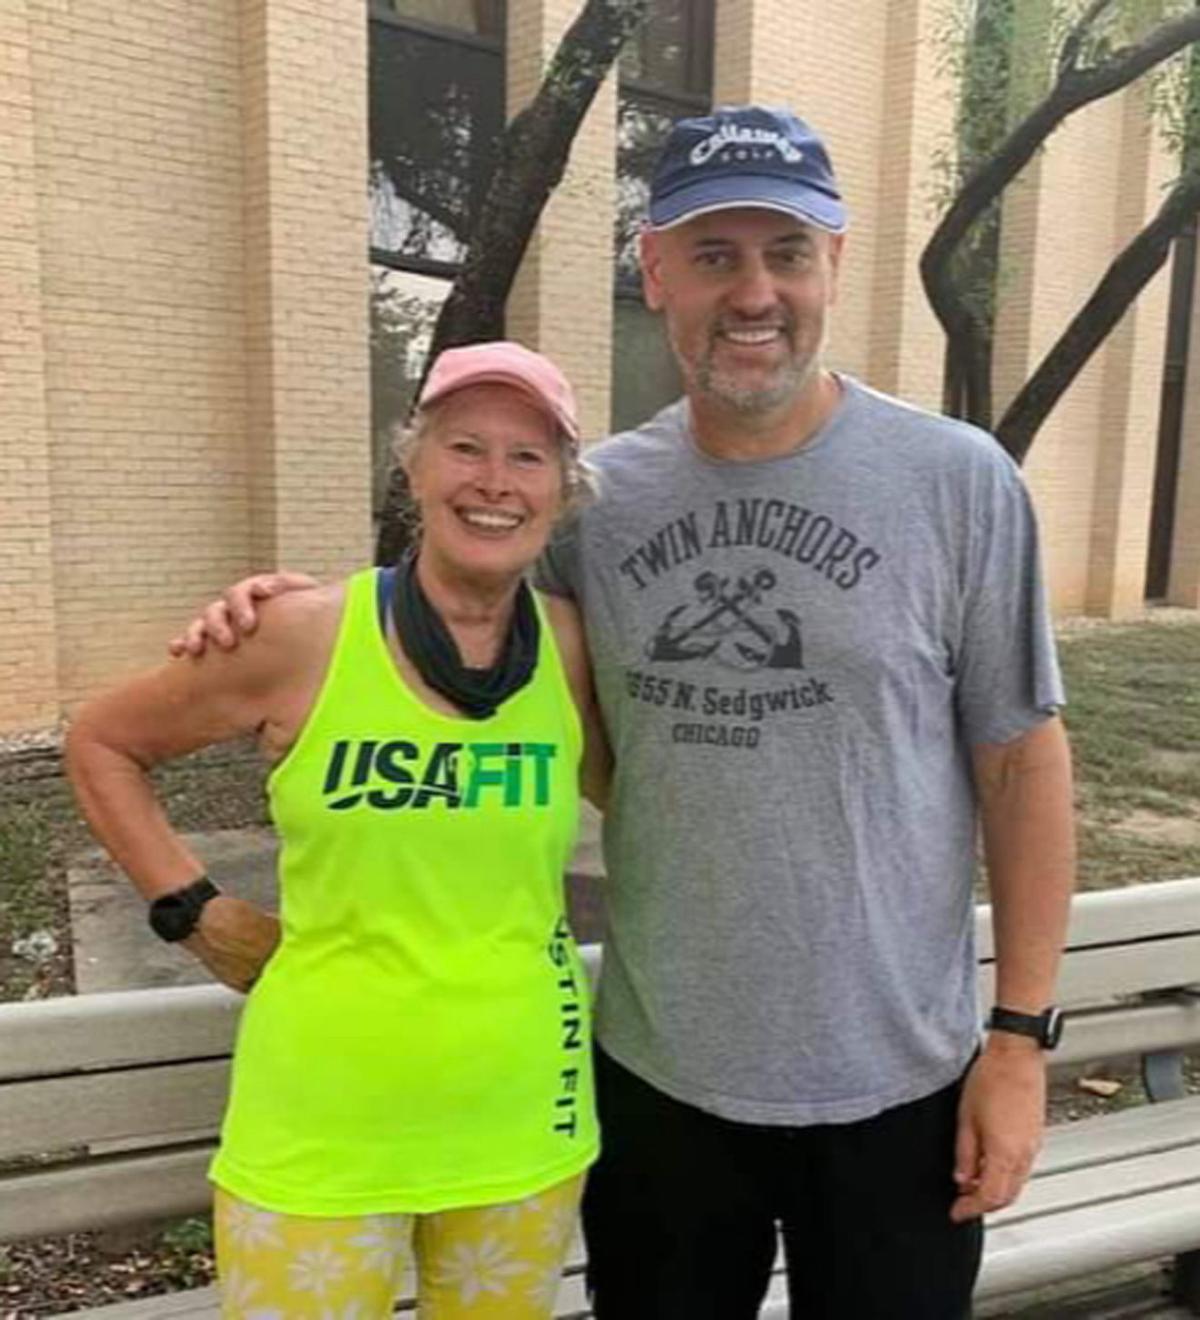 Karen Ostlund and Al Balmer runners